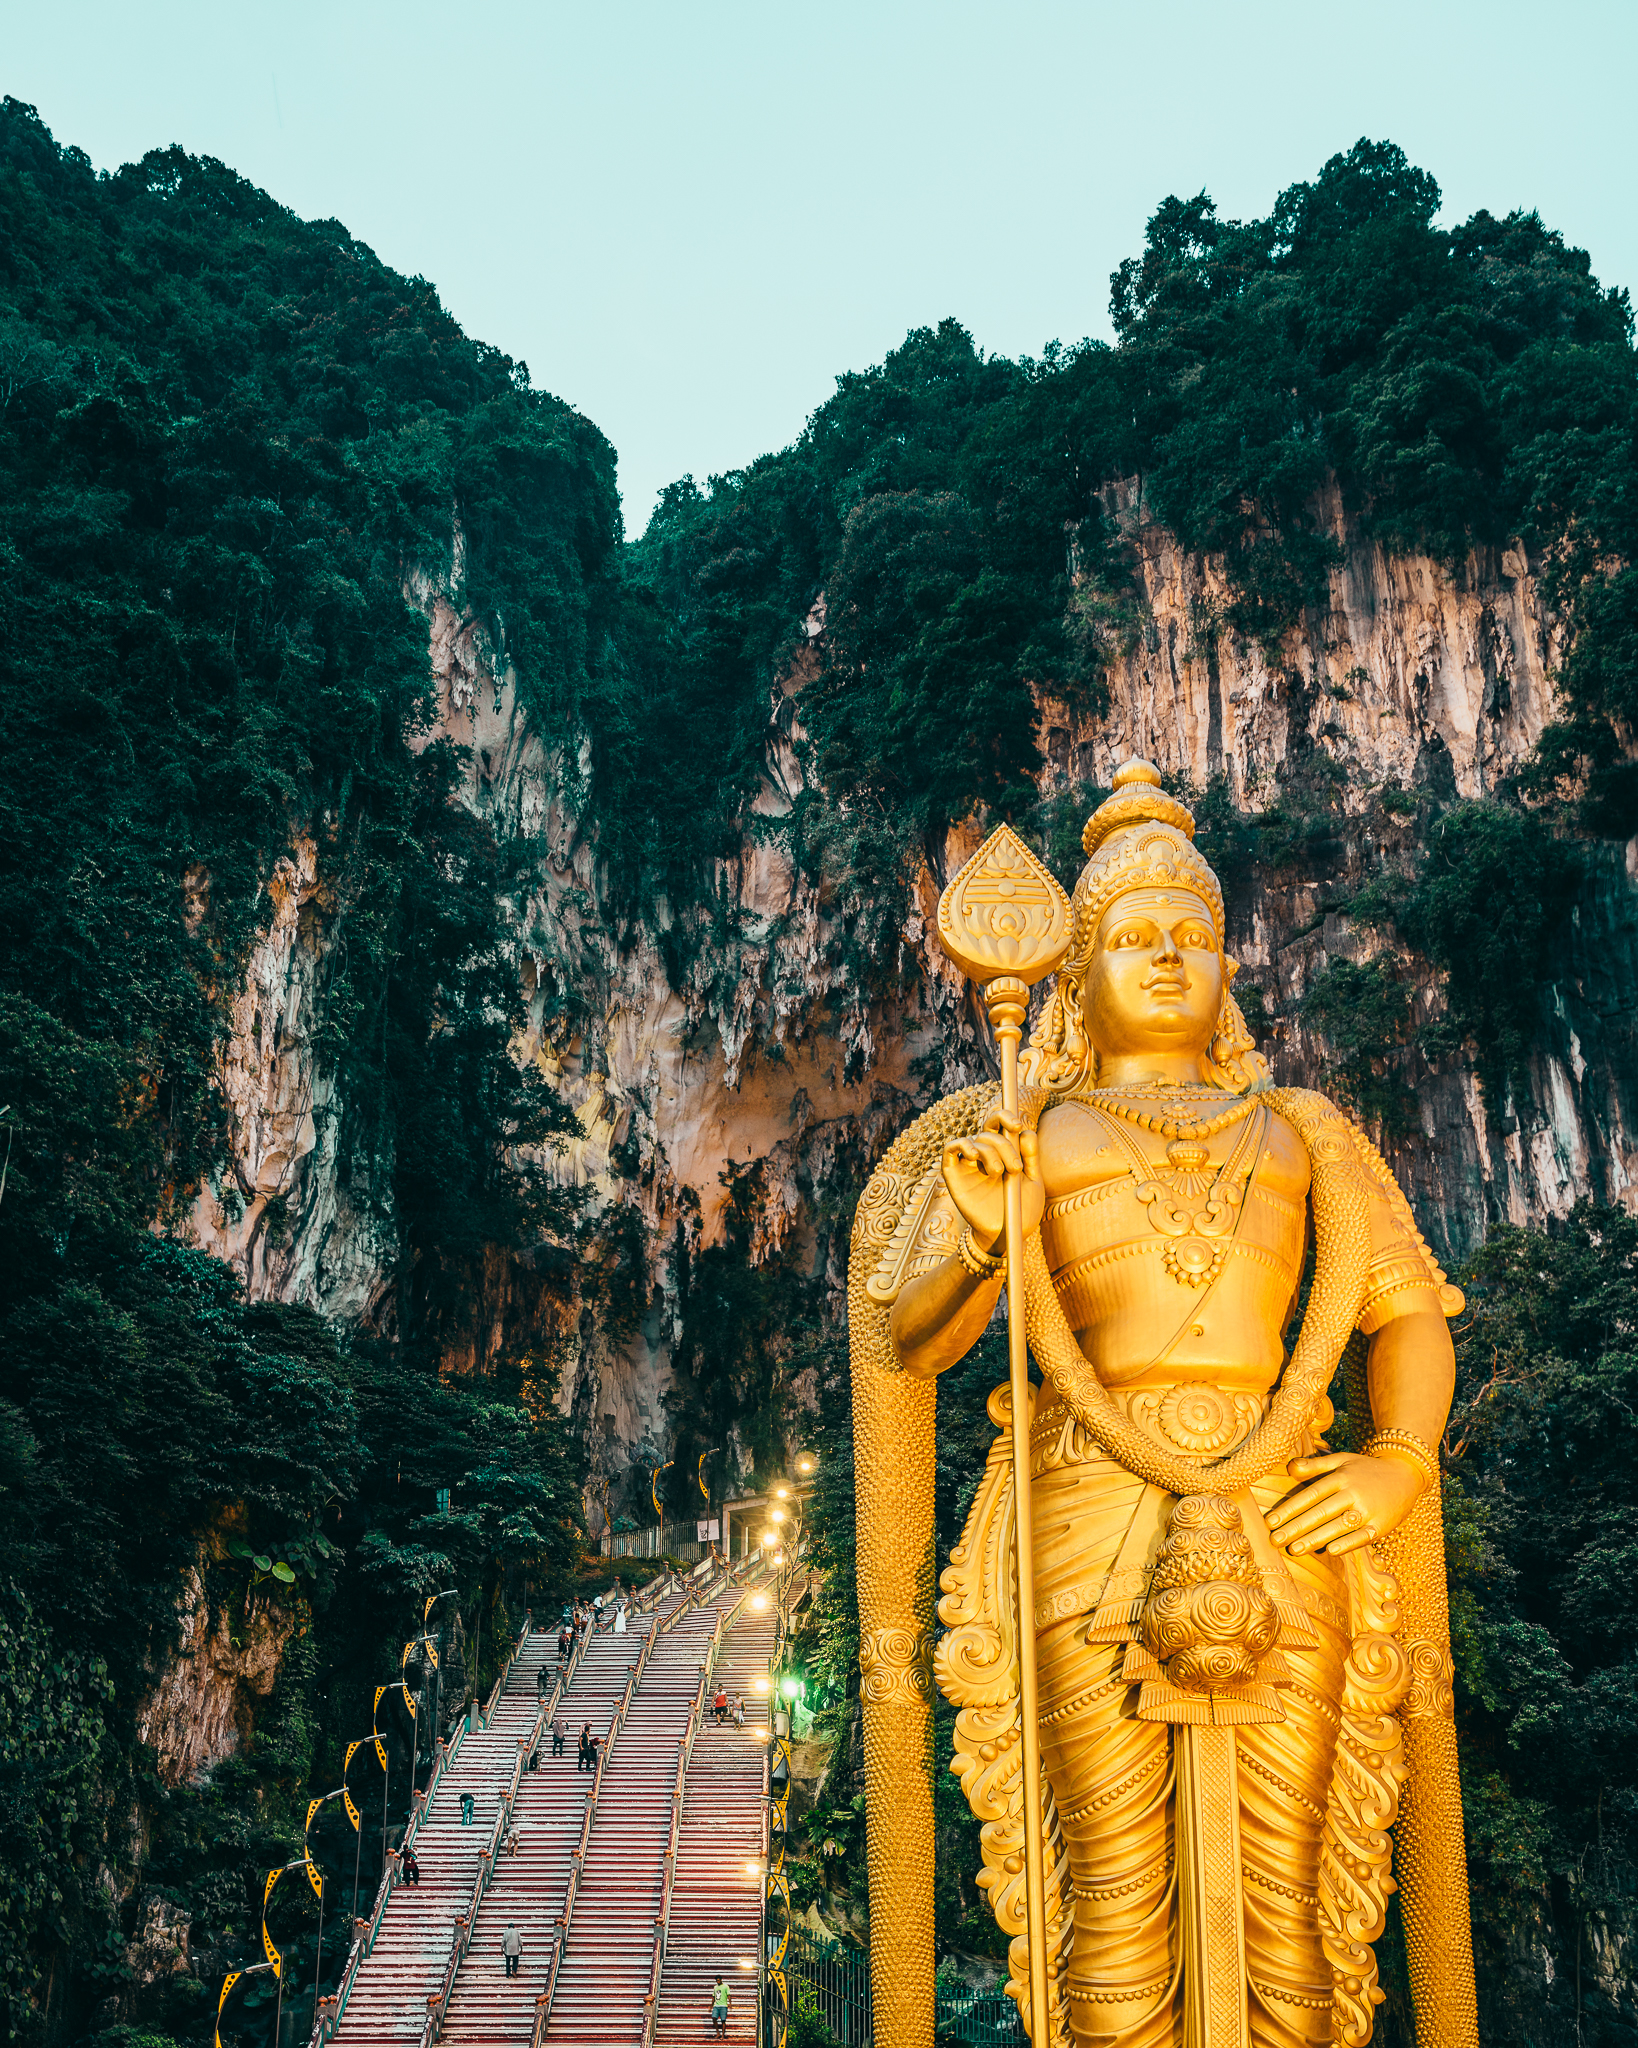 Entrance of Batu Caves -272 steps to go!